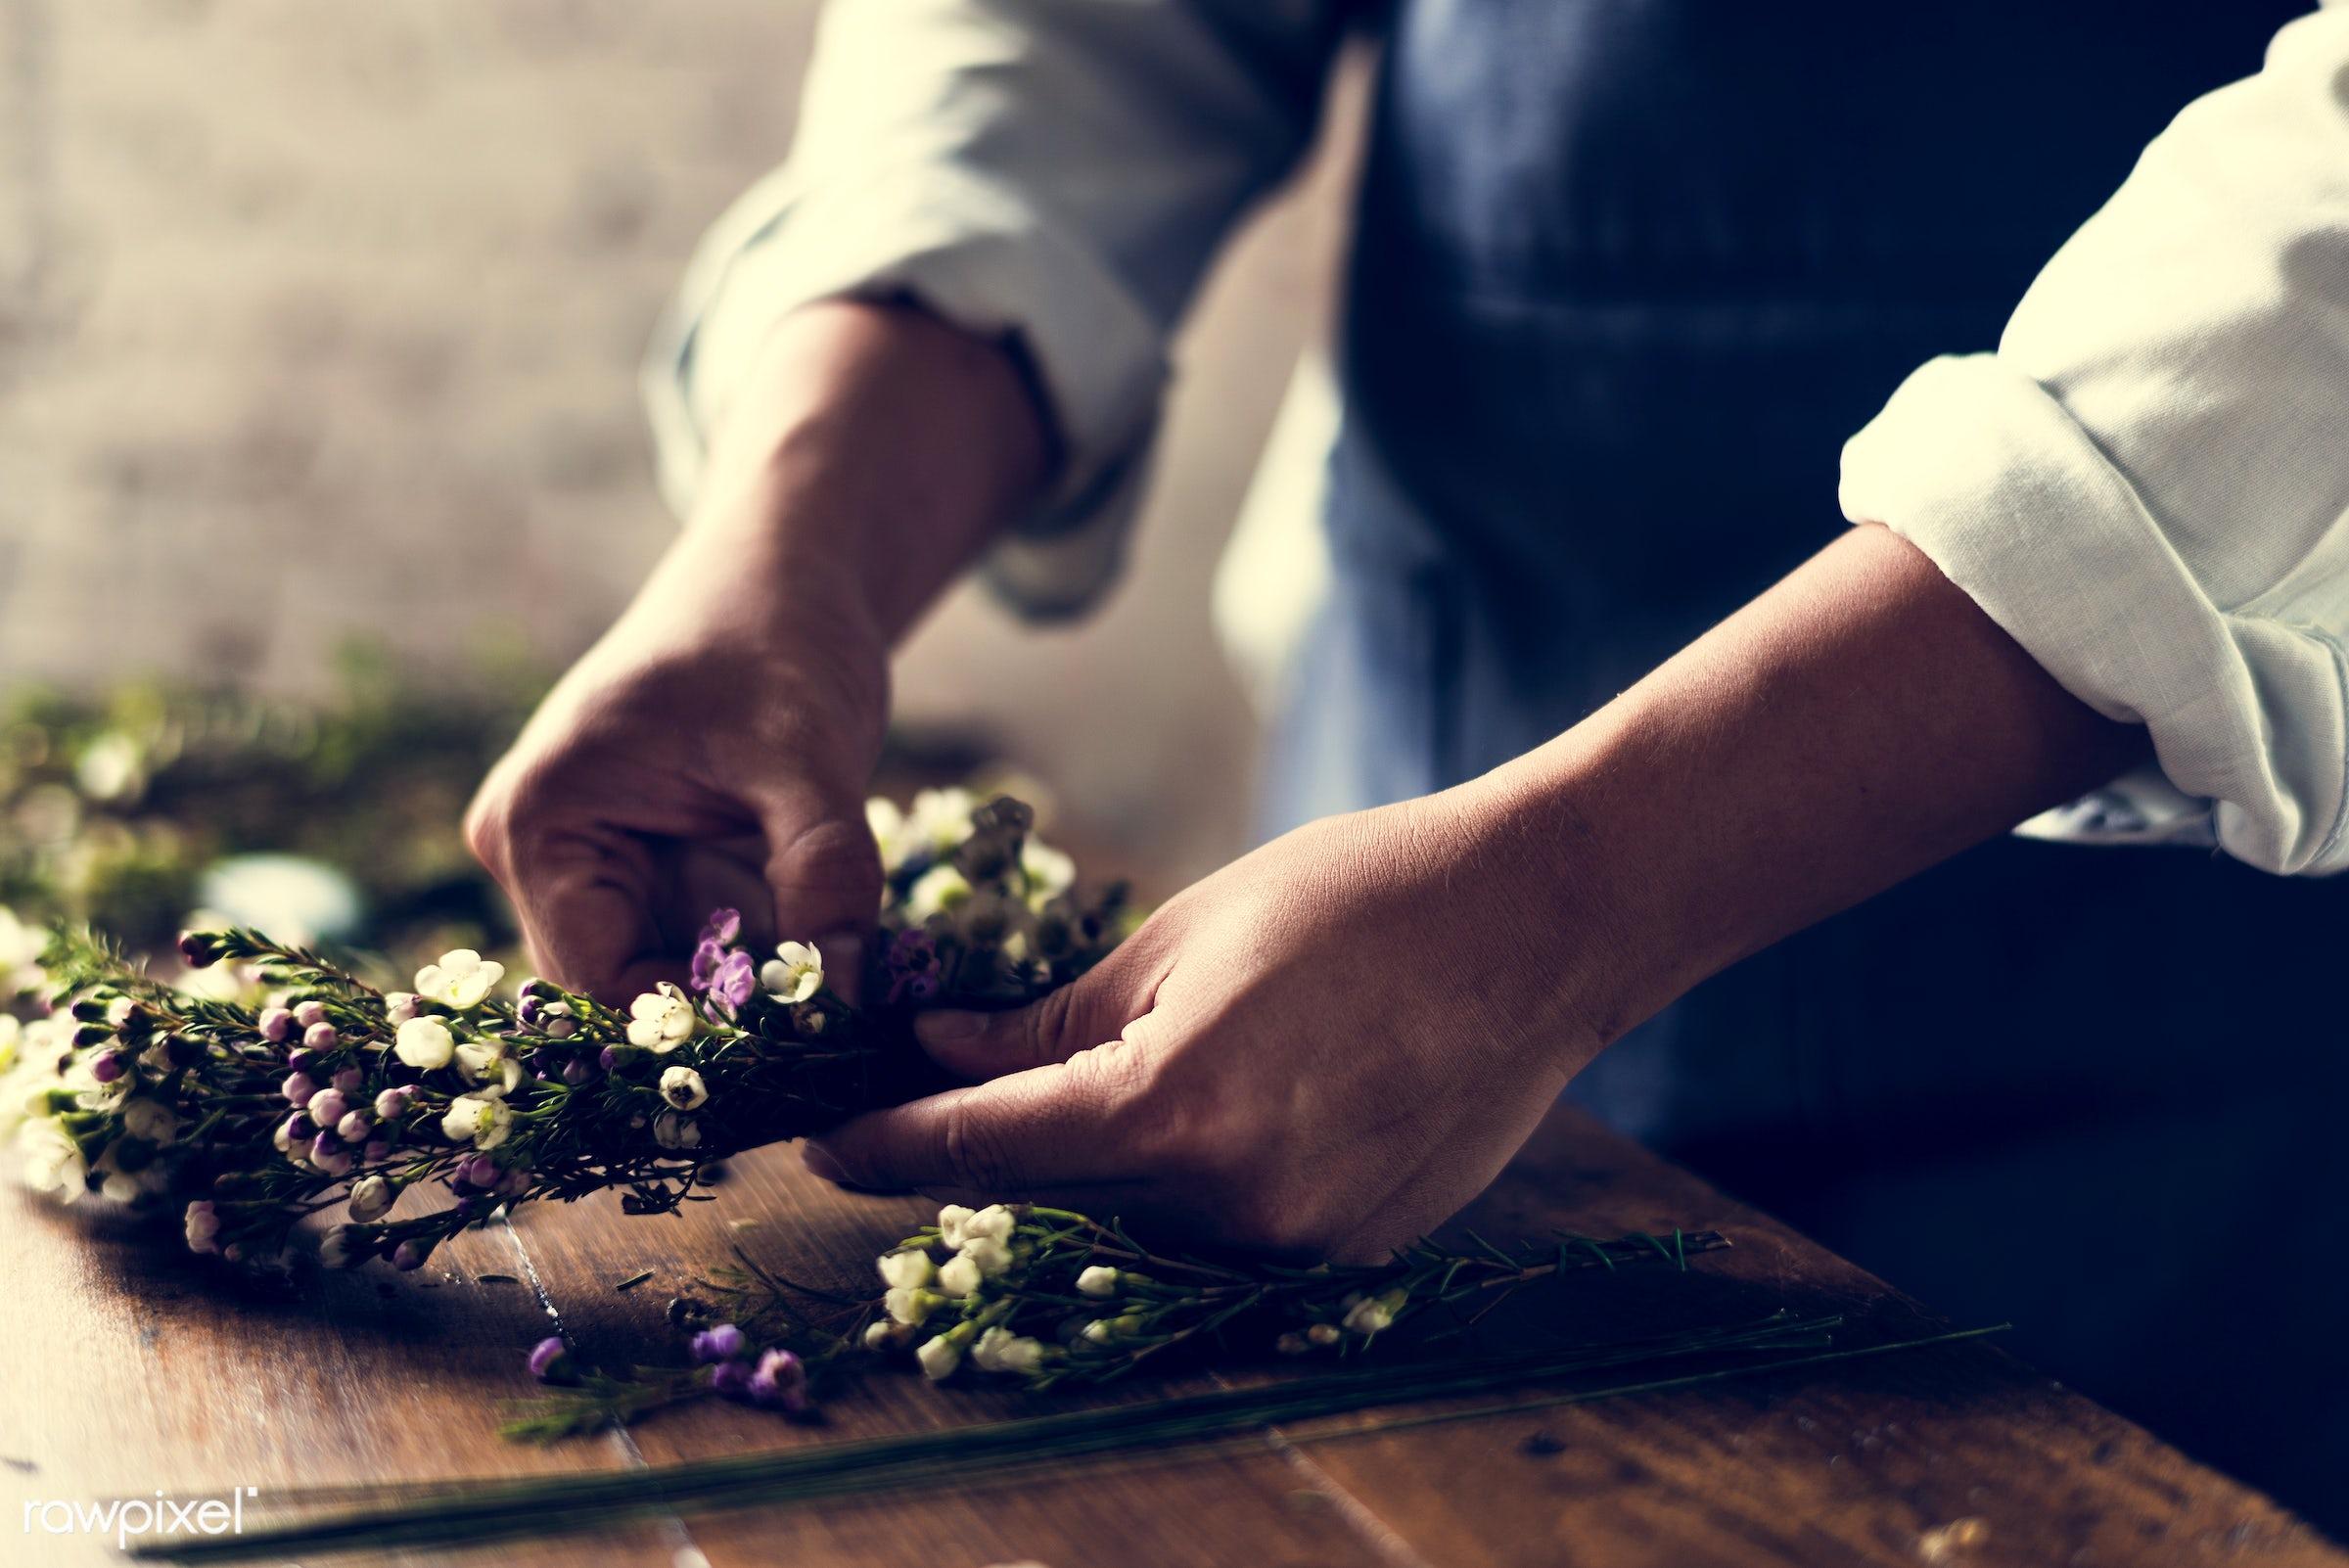 shop, festive, person, detail, decorative, colorful, events, plants, spring, people, blossom, wax flower, decor, nature,...